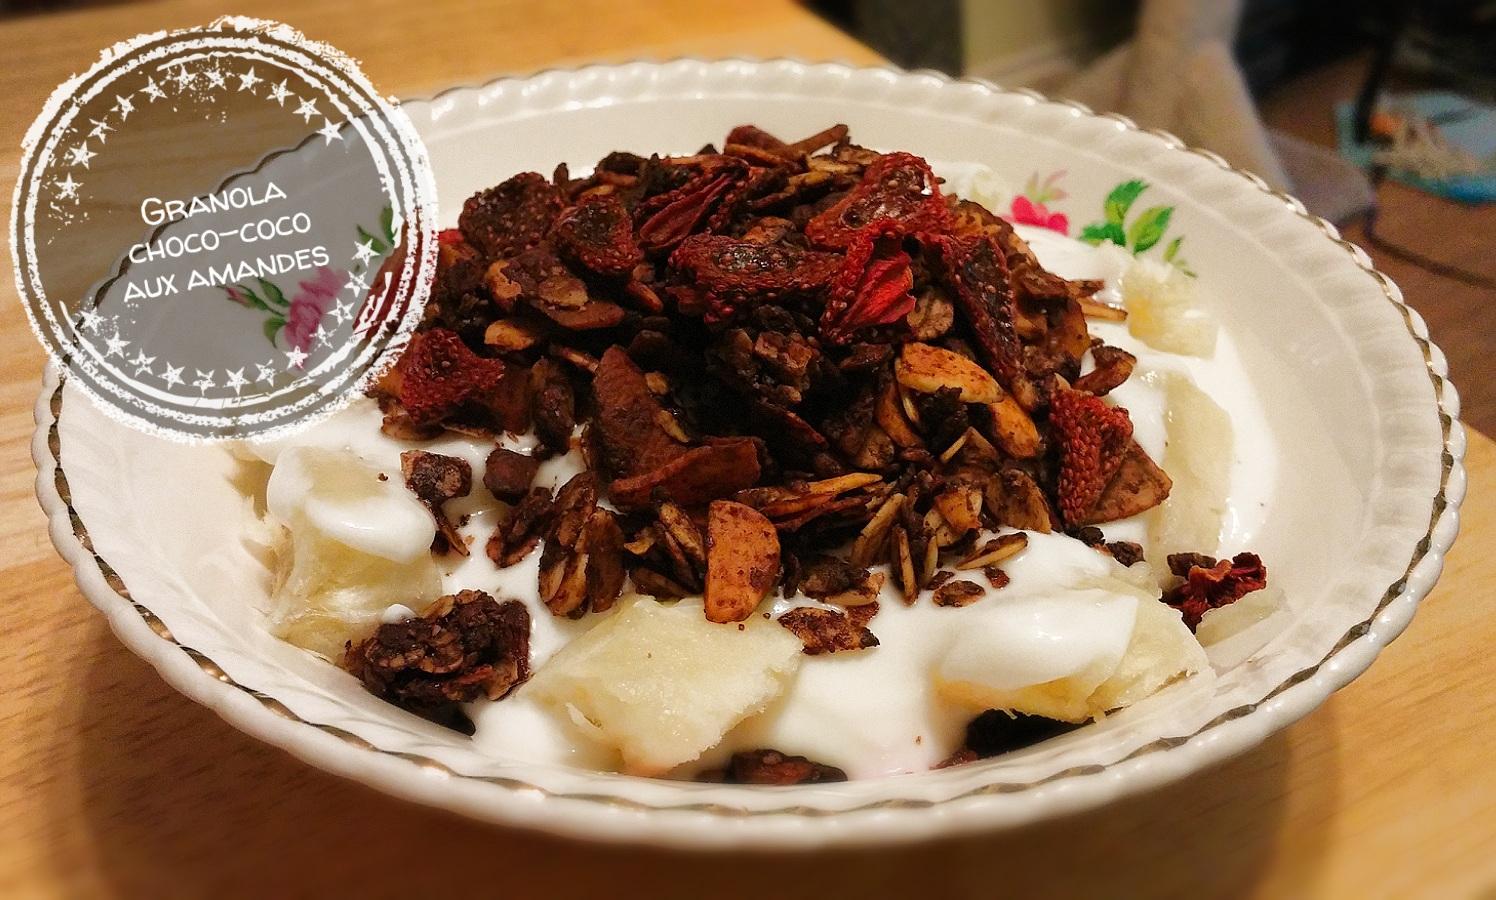 Granola choco-coco aux amandes - Auboutdelalangue.com